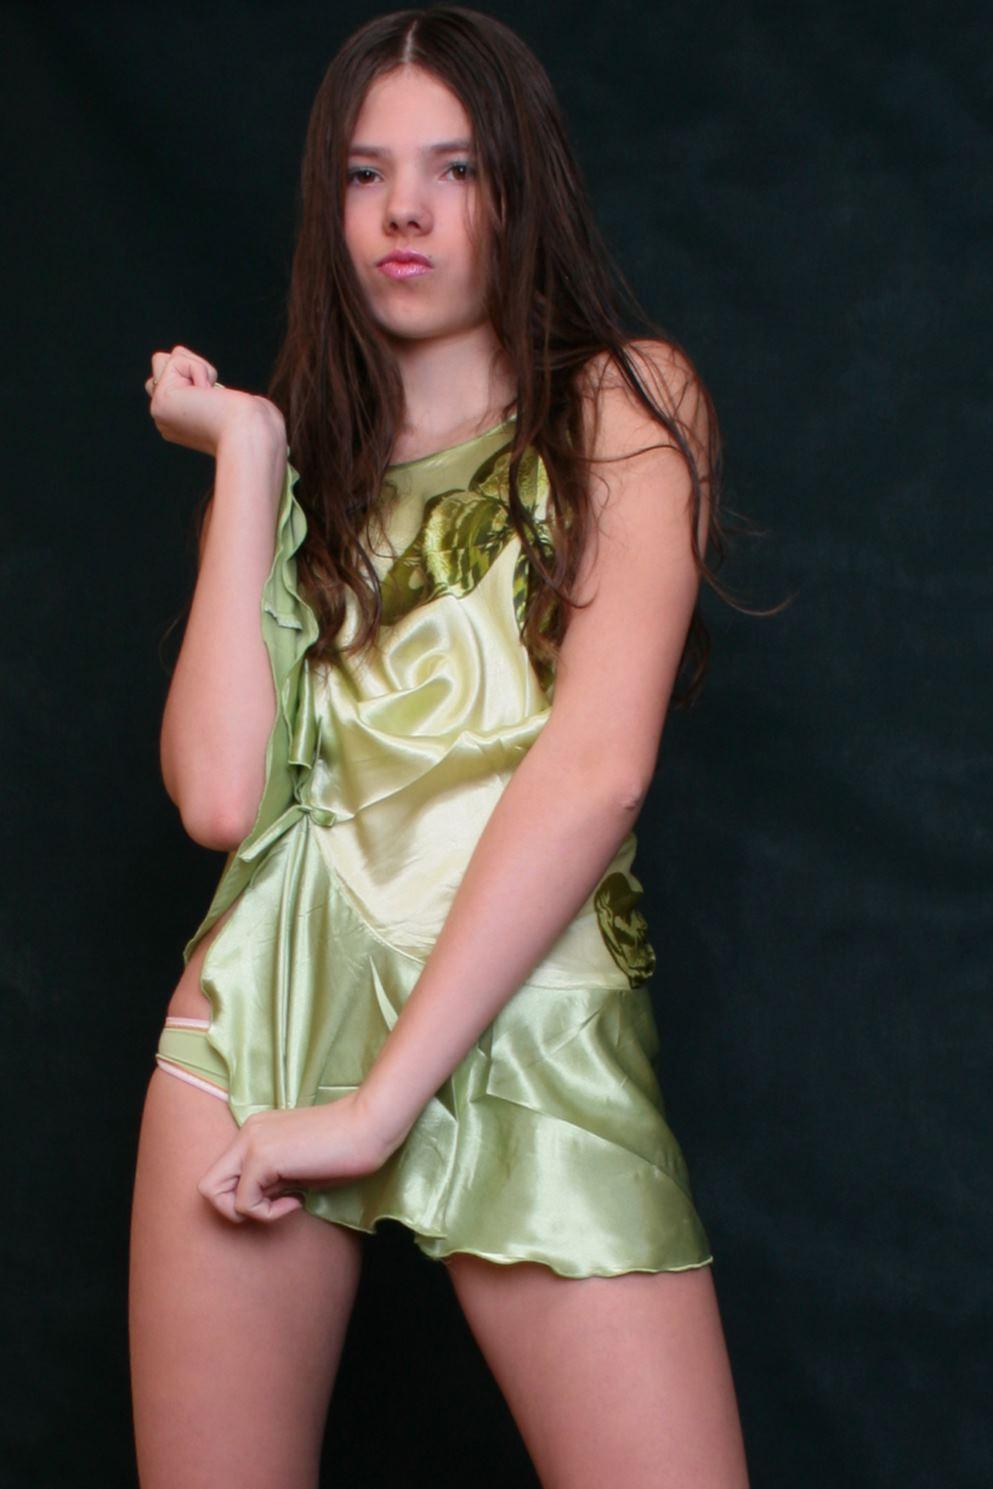 Sandra Orlow Nude - lasopasierra